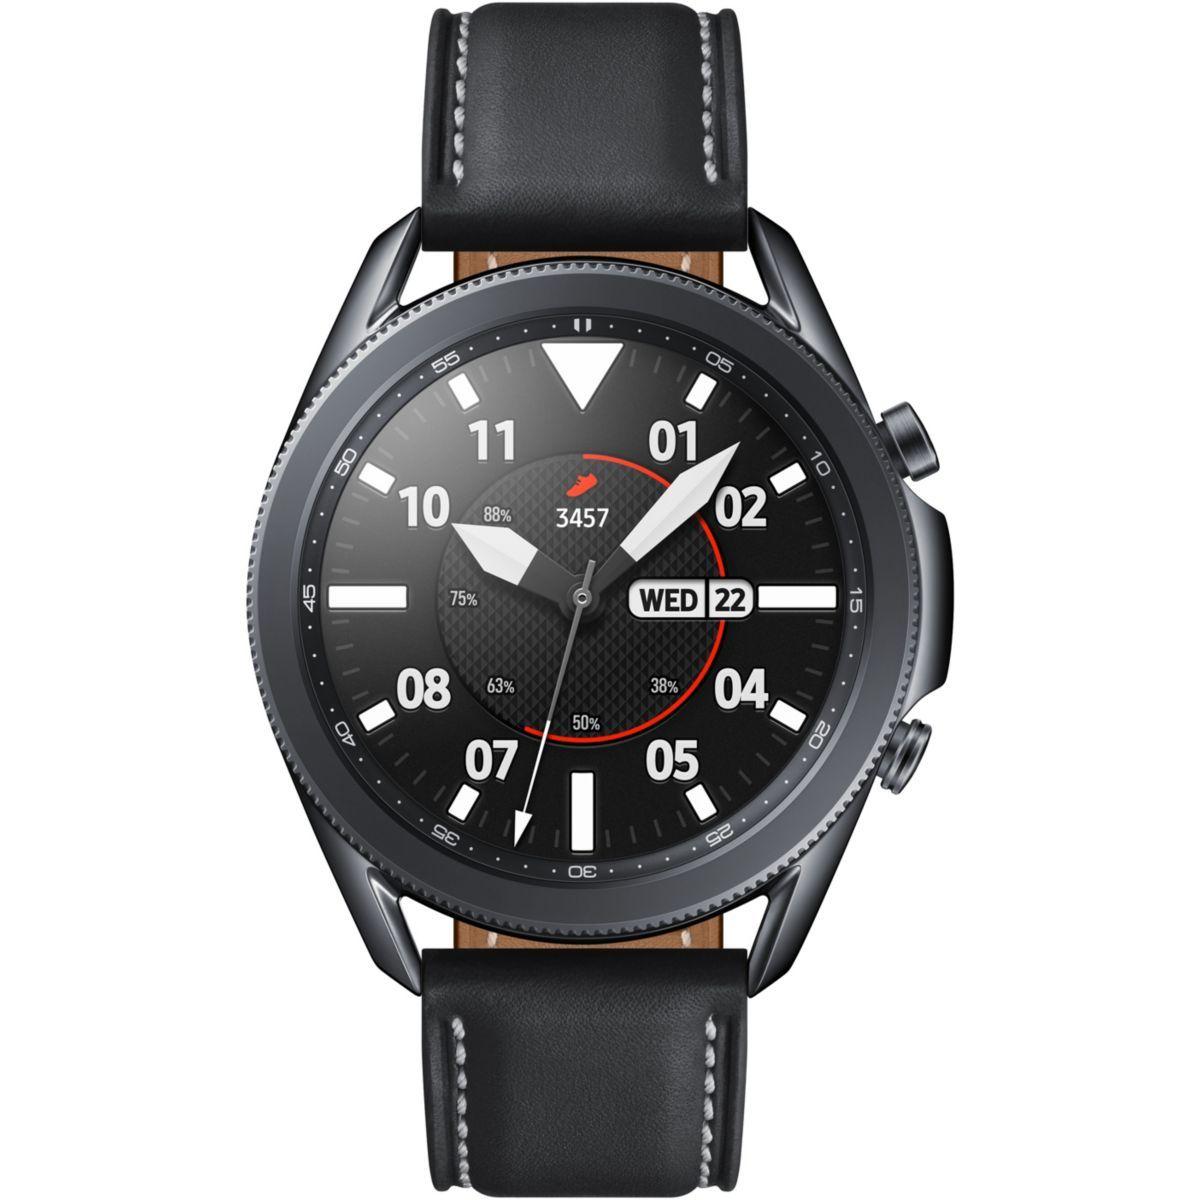 Montre connectée Samsung Galaxy Watch 3 - 45 mm, Noir (+13,50€ en RP)